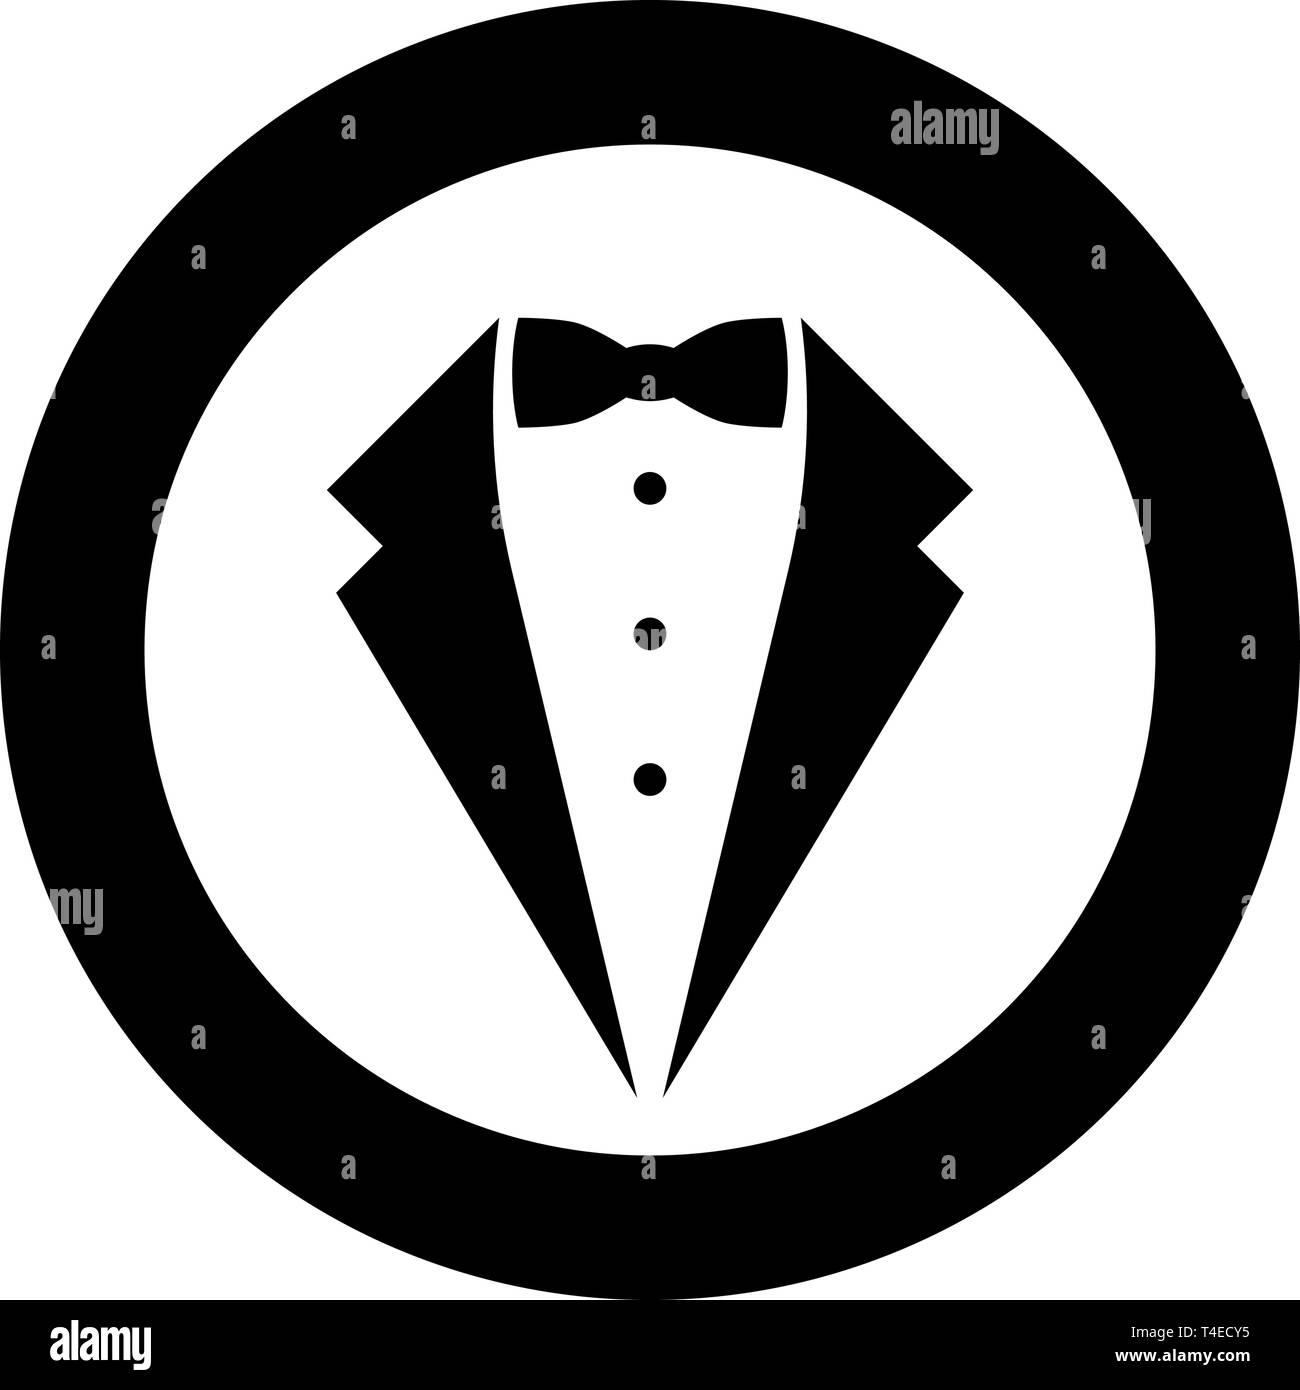 Symbol service dinner jacket bow Tuxedo concept Tux sign